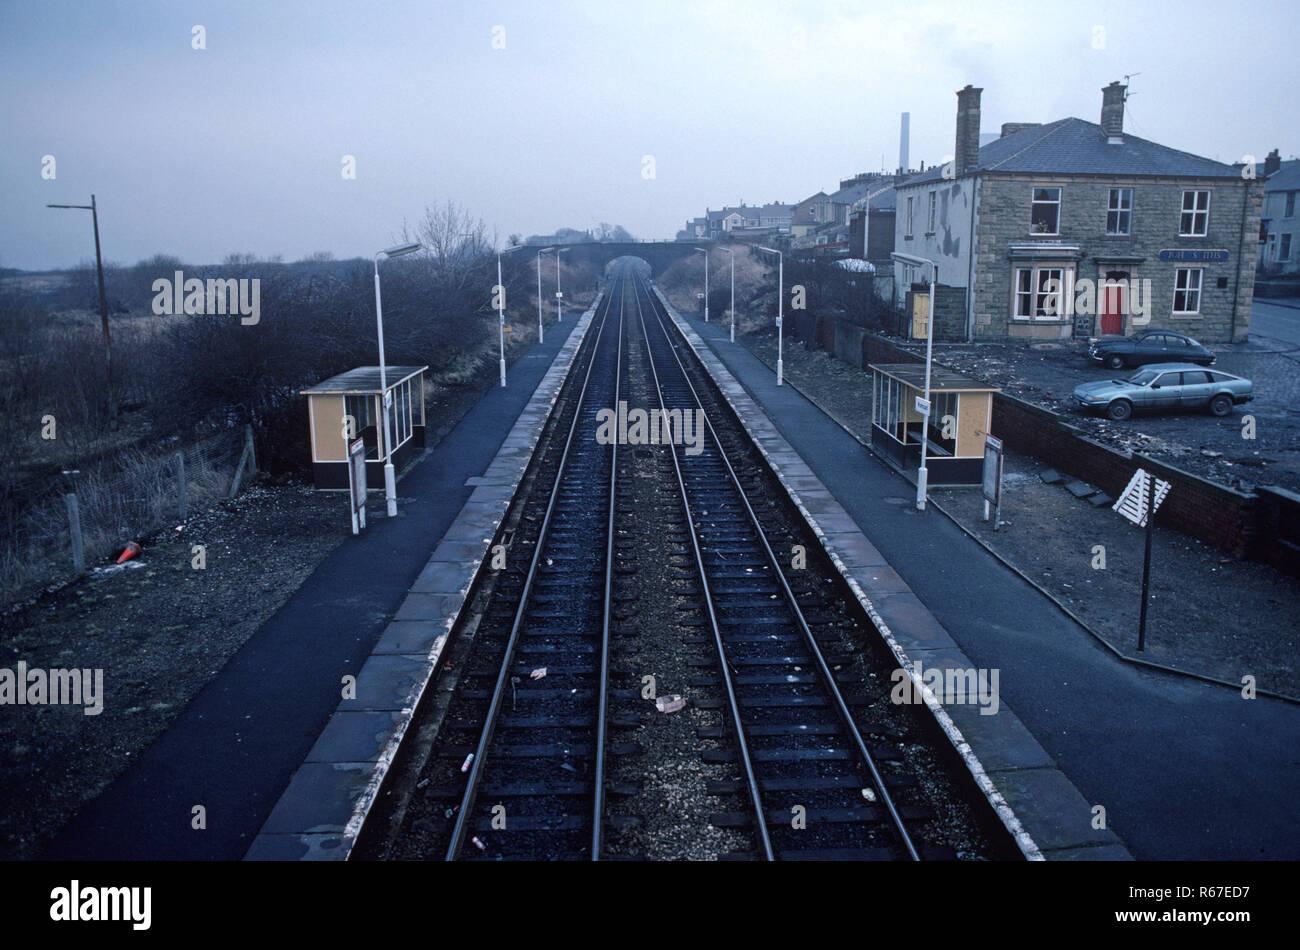 Huncoat railway station on the British Rail Preston to Colne railway station, Lancashire, Great Britain - Stock Image